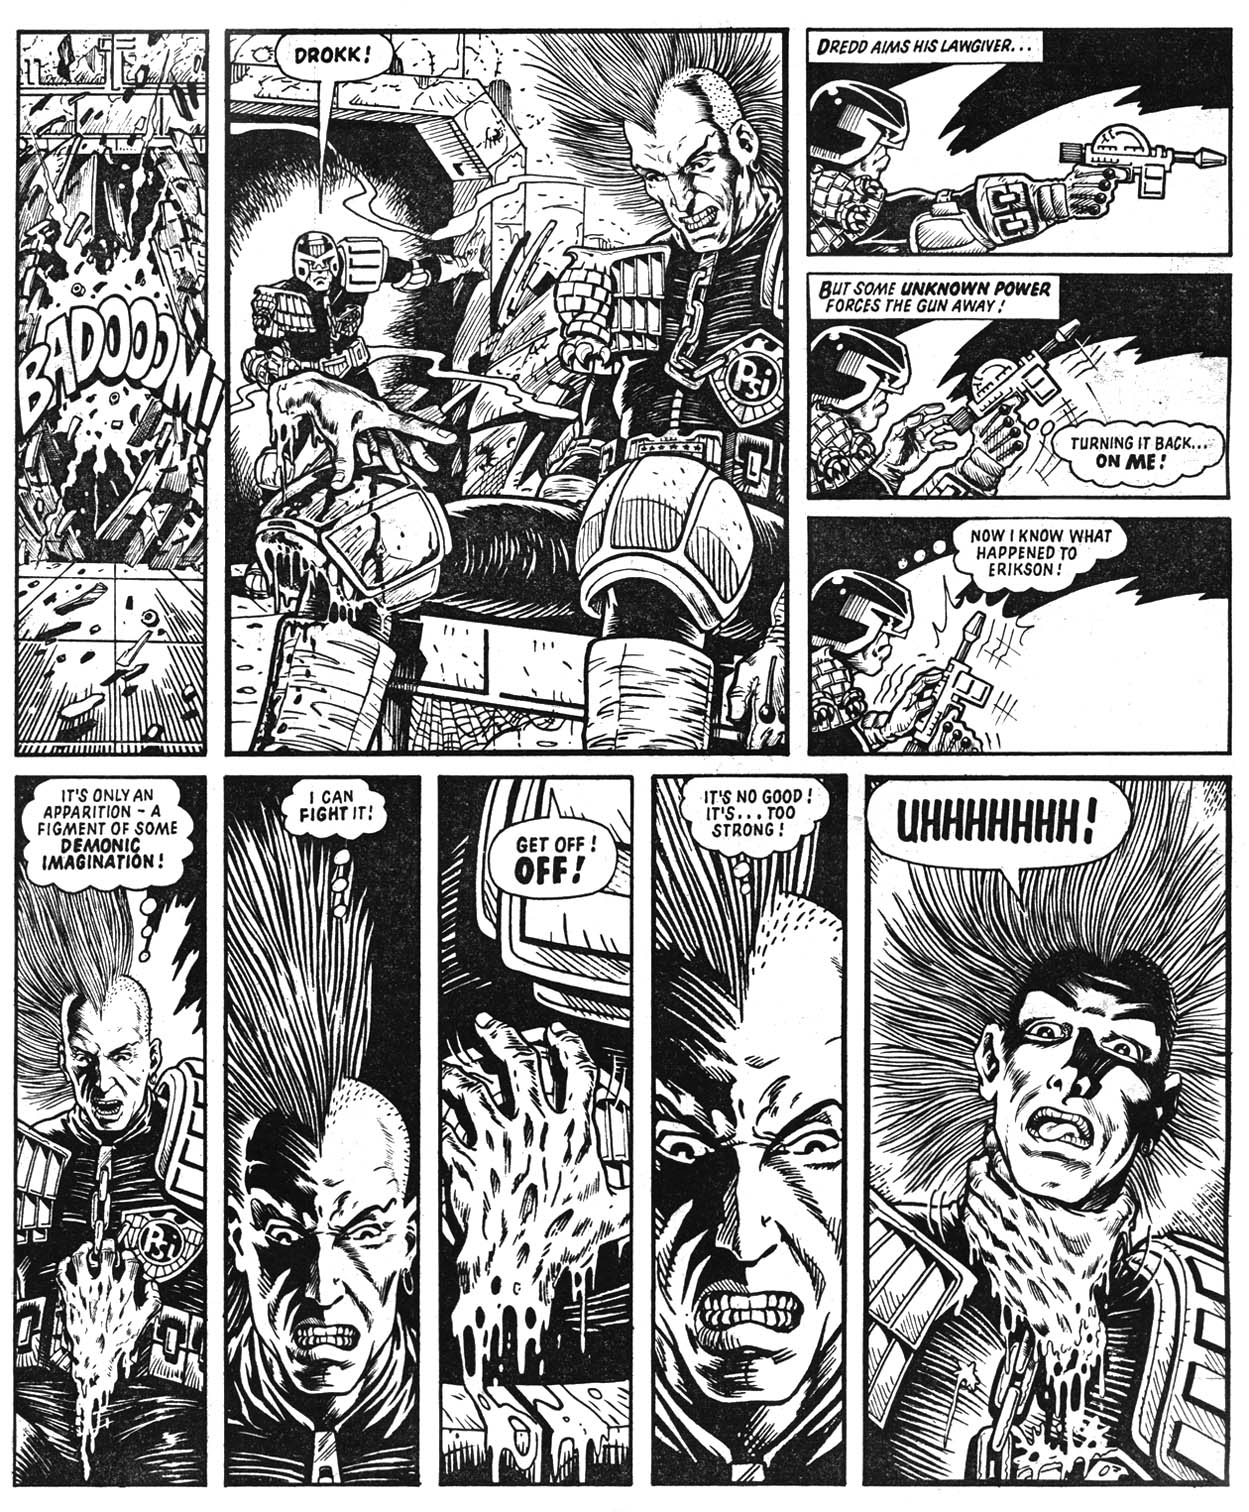 Judge Dredd 22 review